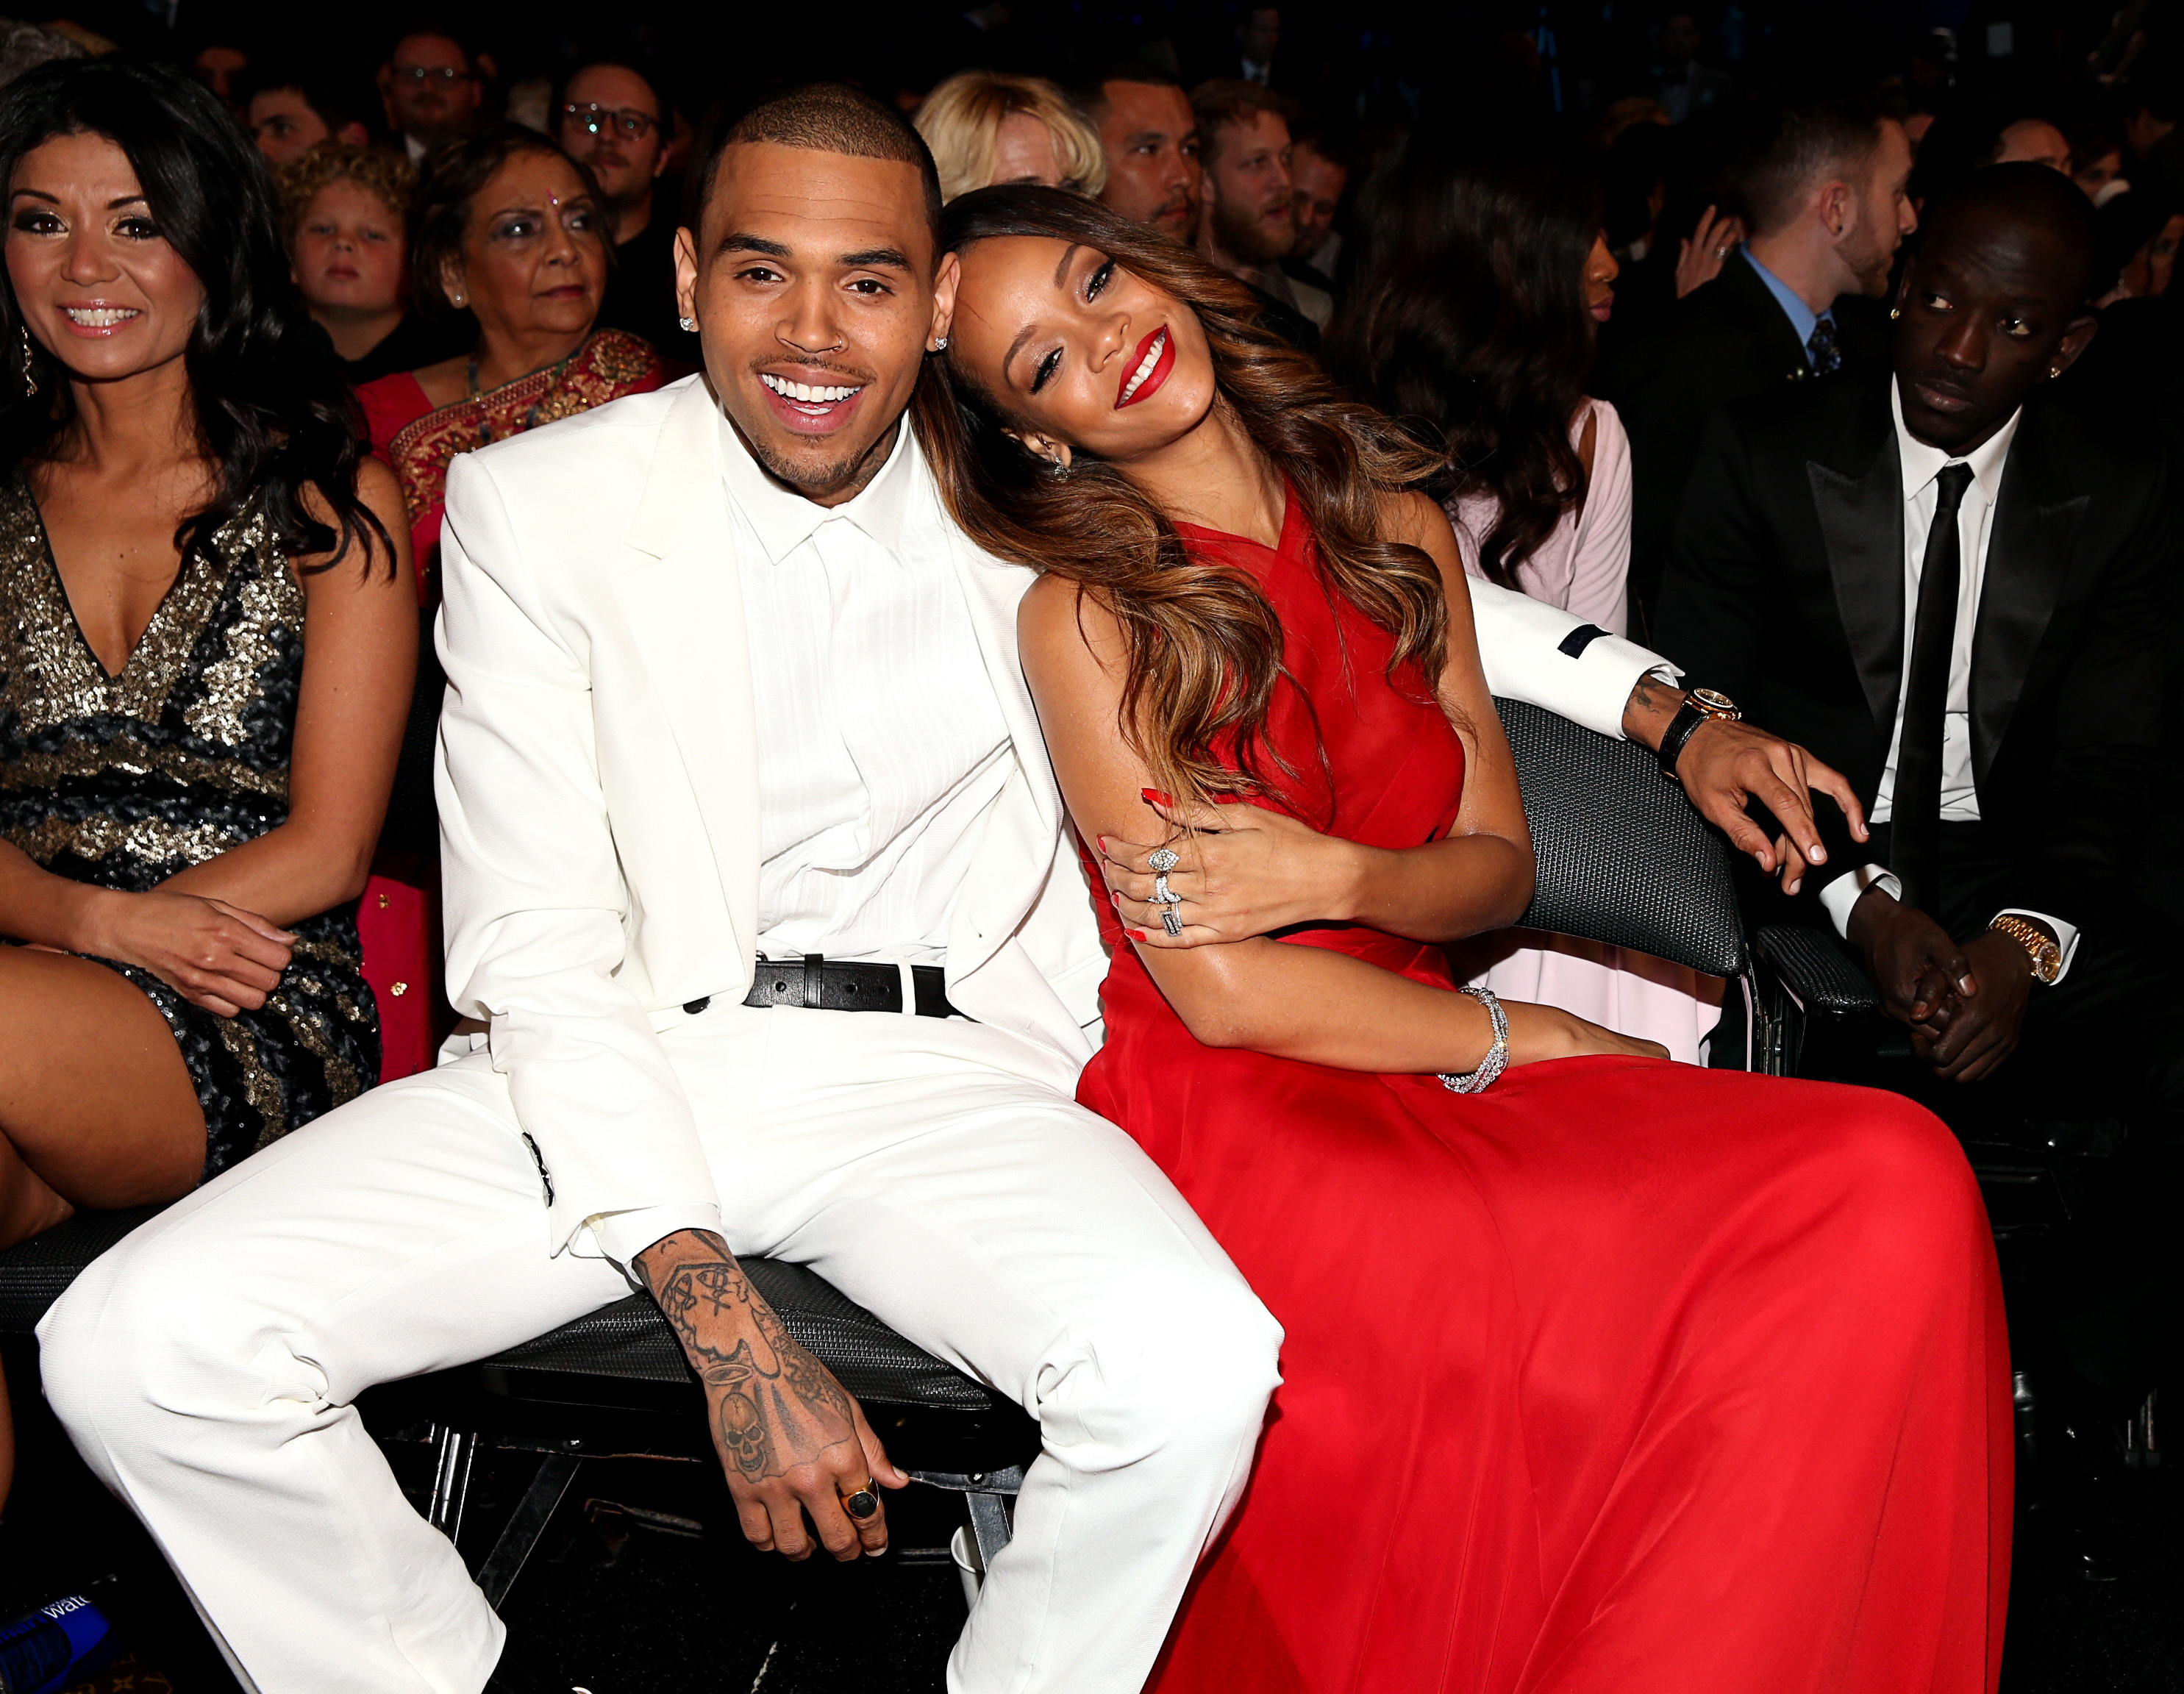 Chris Brown white suit Rihanna red dress